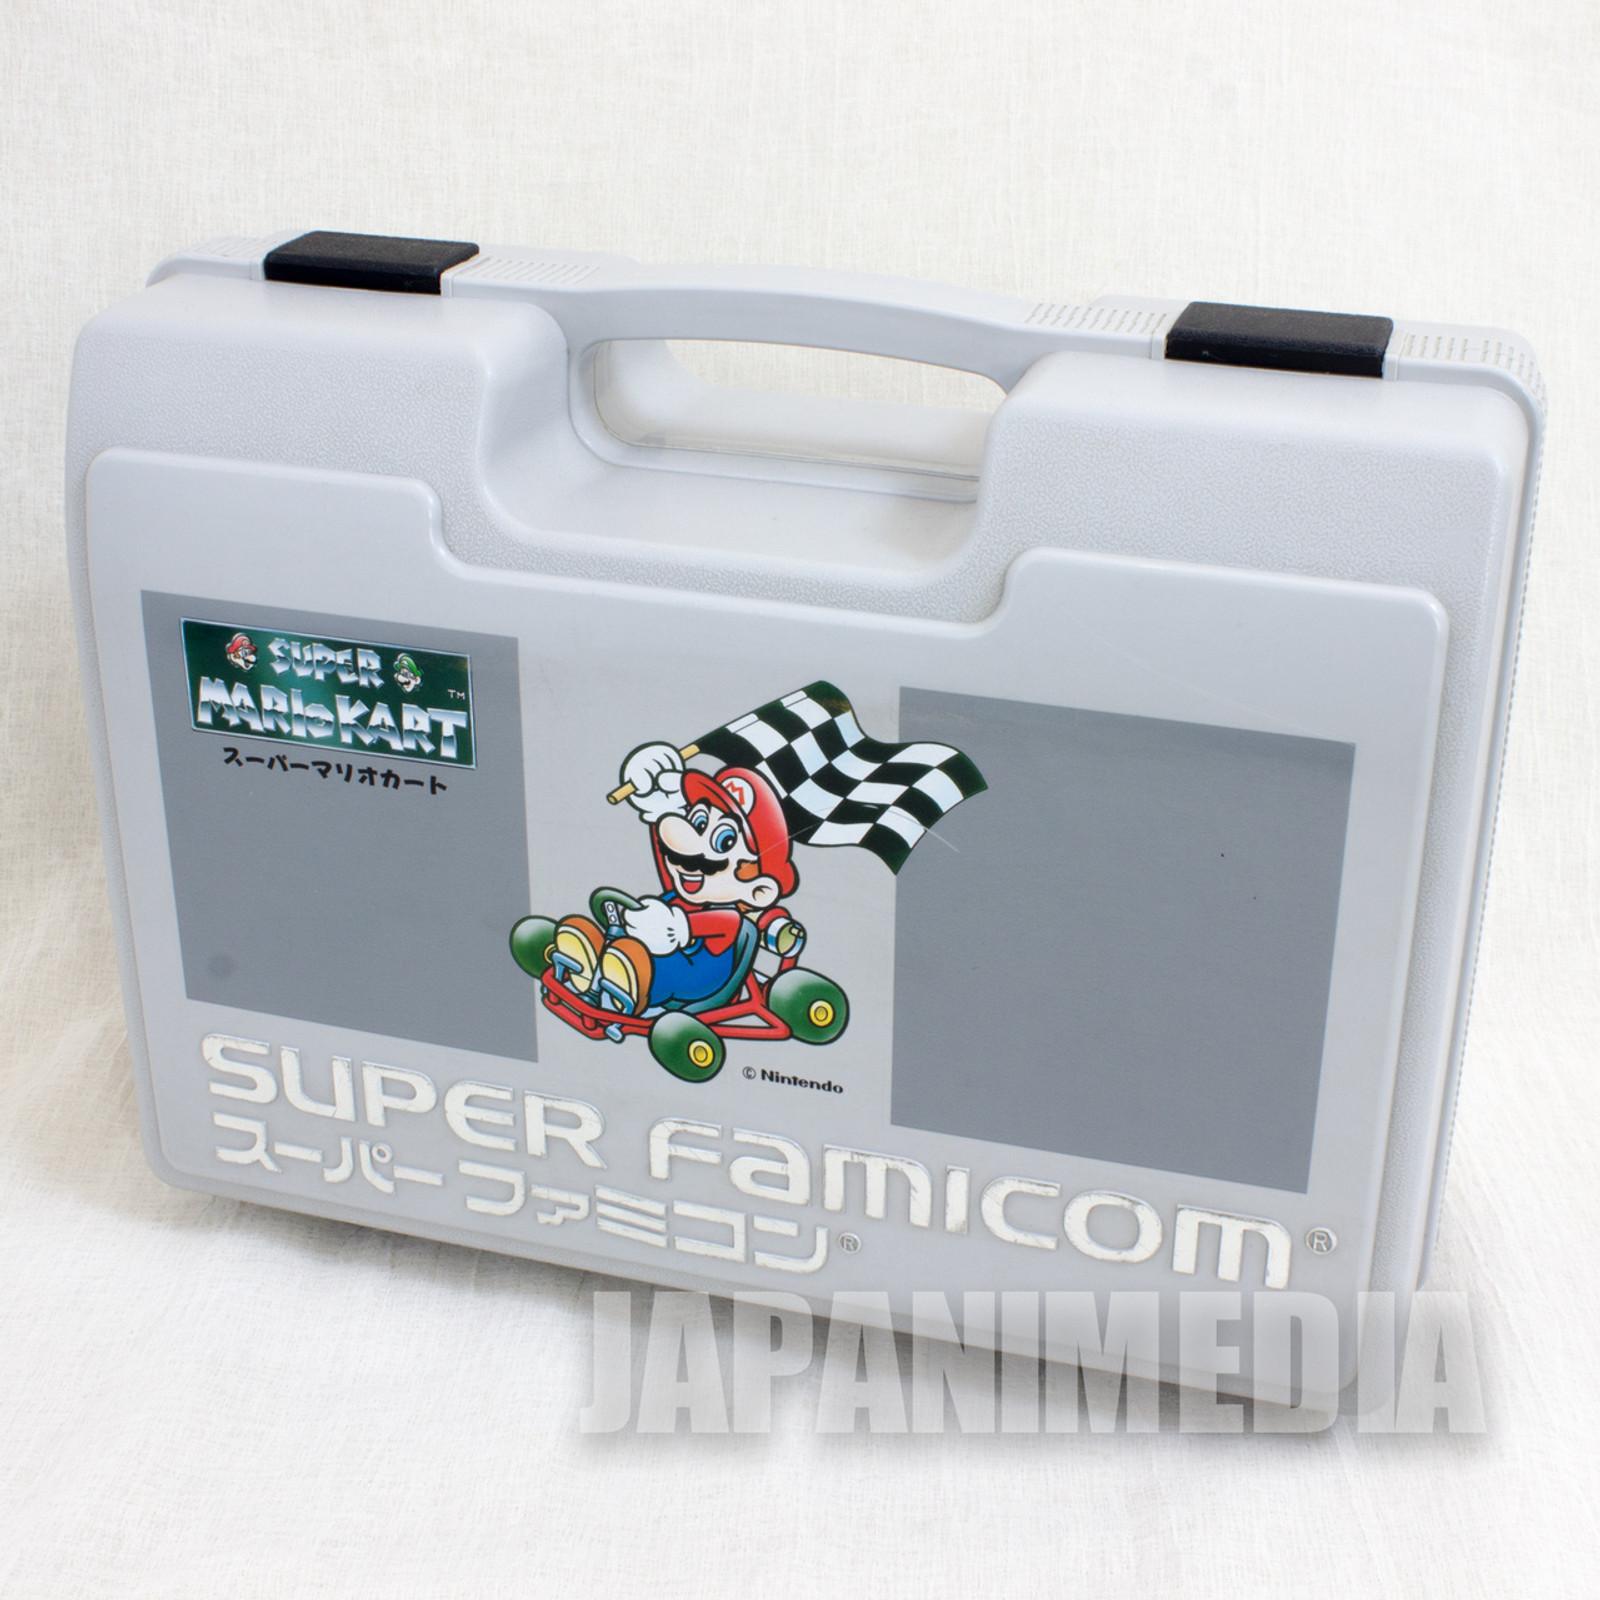 Retro RARE! Super Famicom Mario Kart Cassete Plastic Case JAPAN NINTNEDO SNES